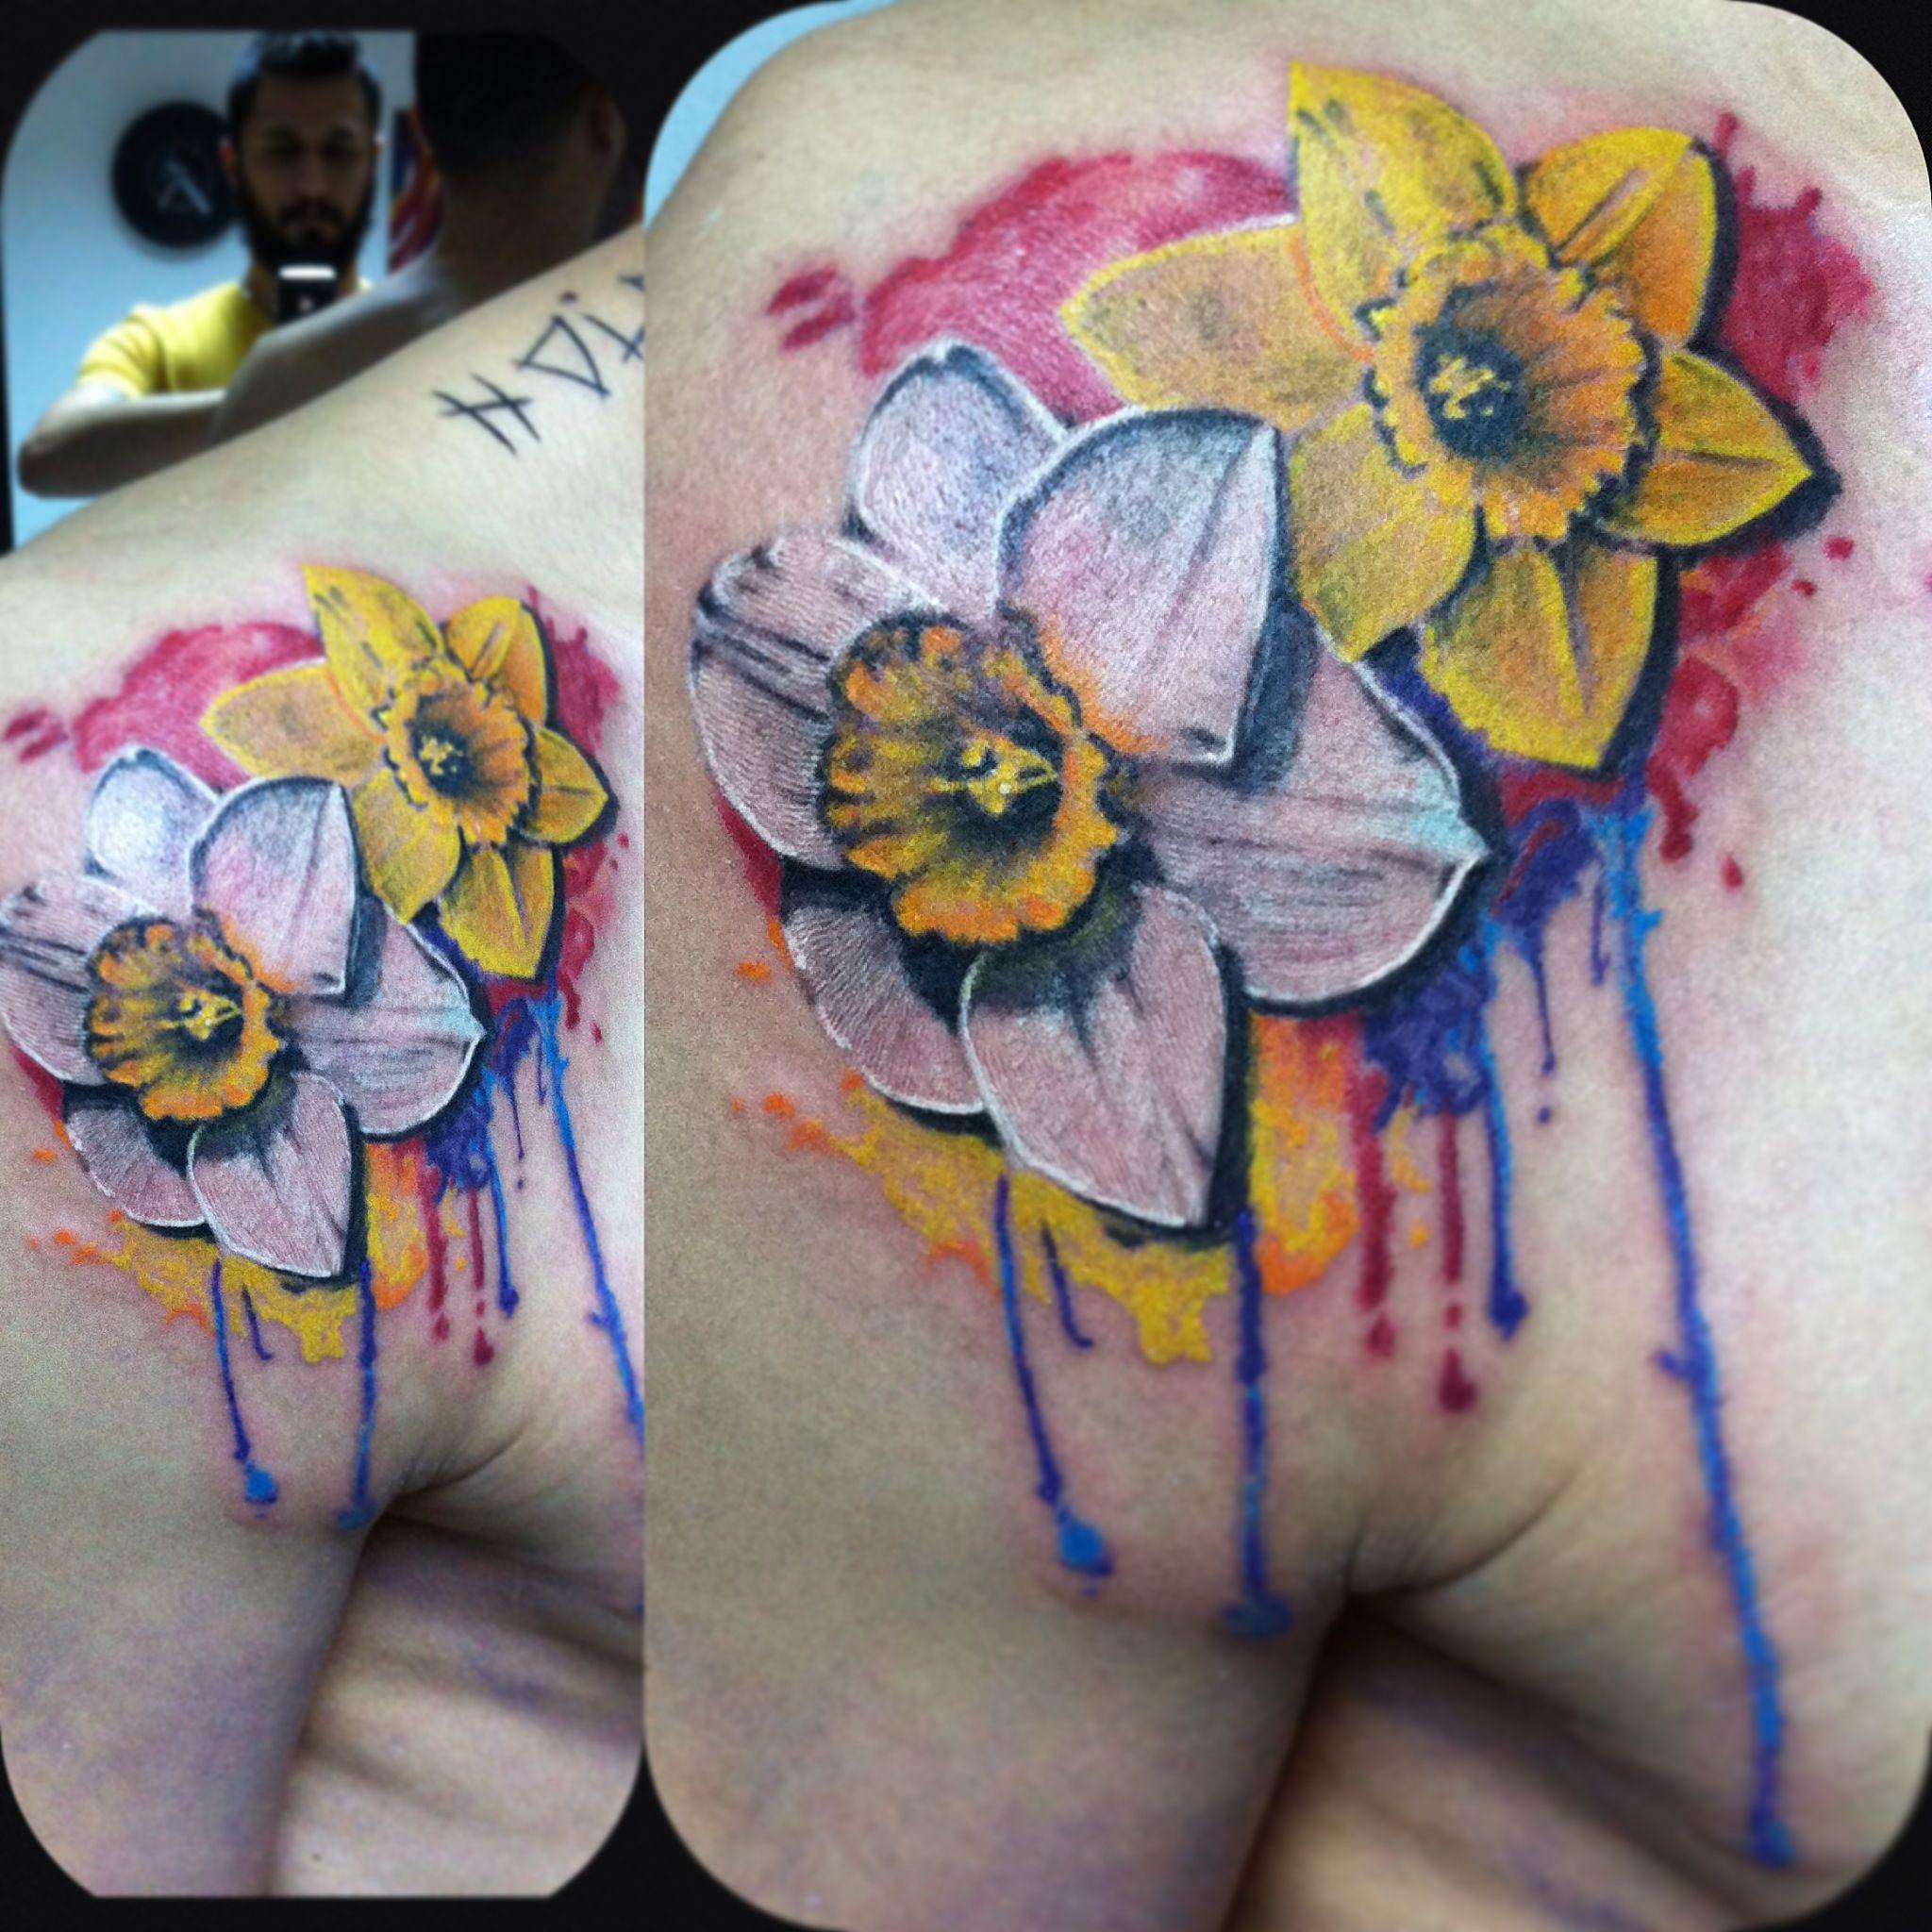 Daffodil Watercolor Tattoo Google Search Daffodil Tattoo Daffodils Watercolor Flowers